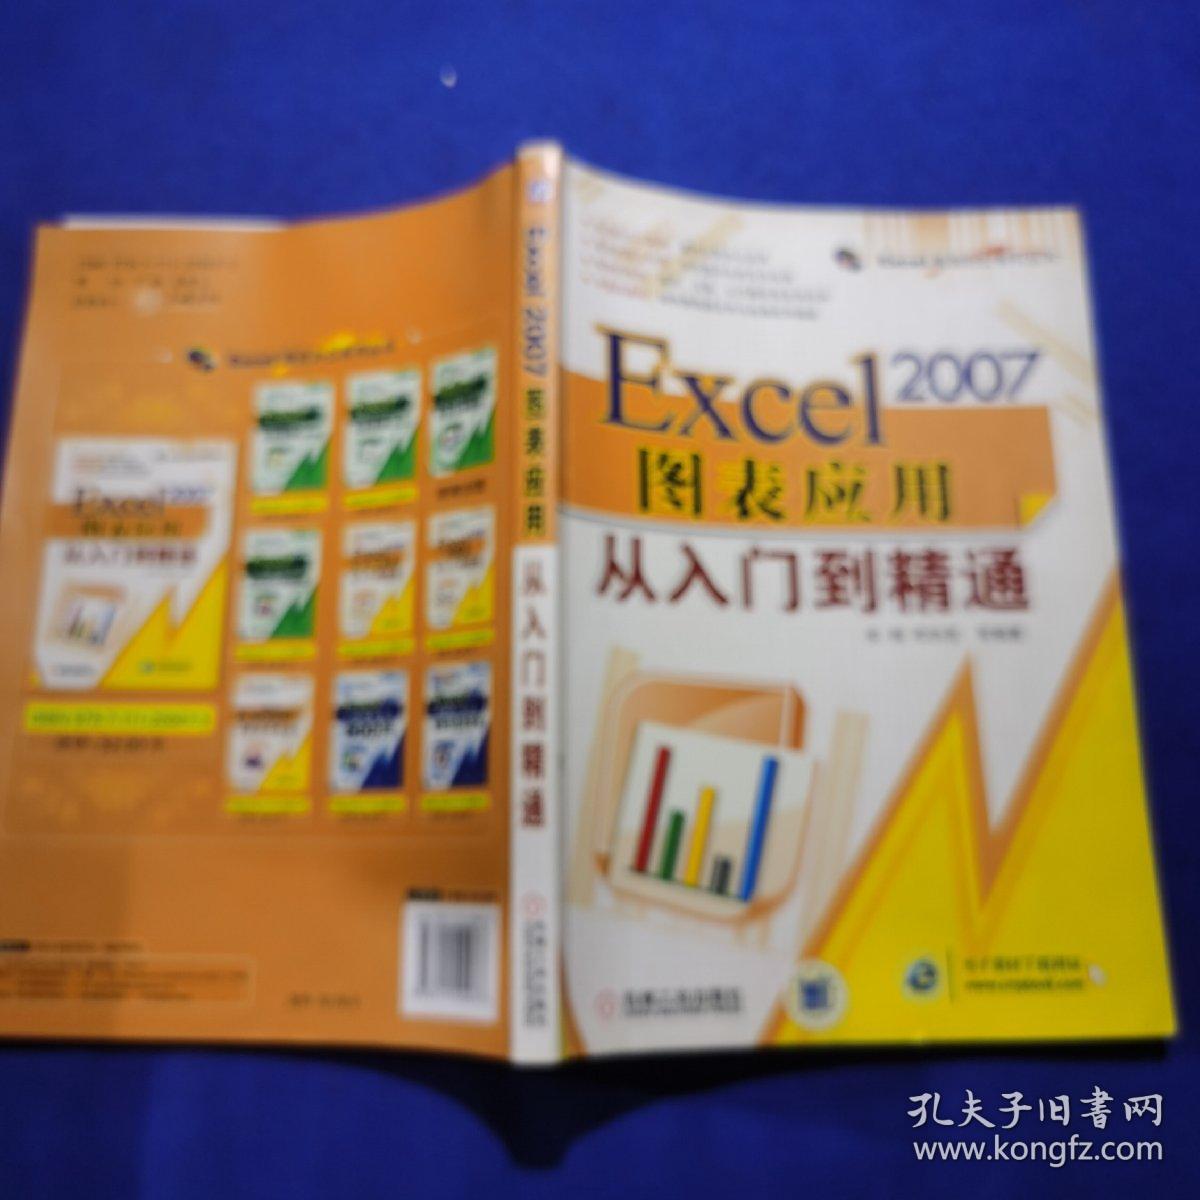 Excel 2007图表应用从入门到精通